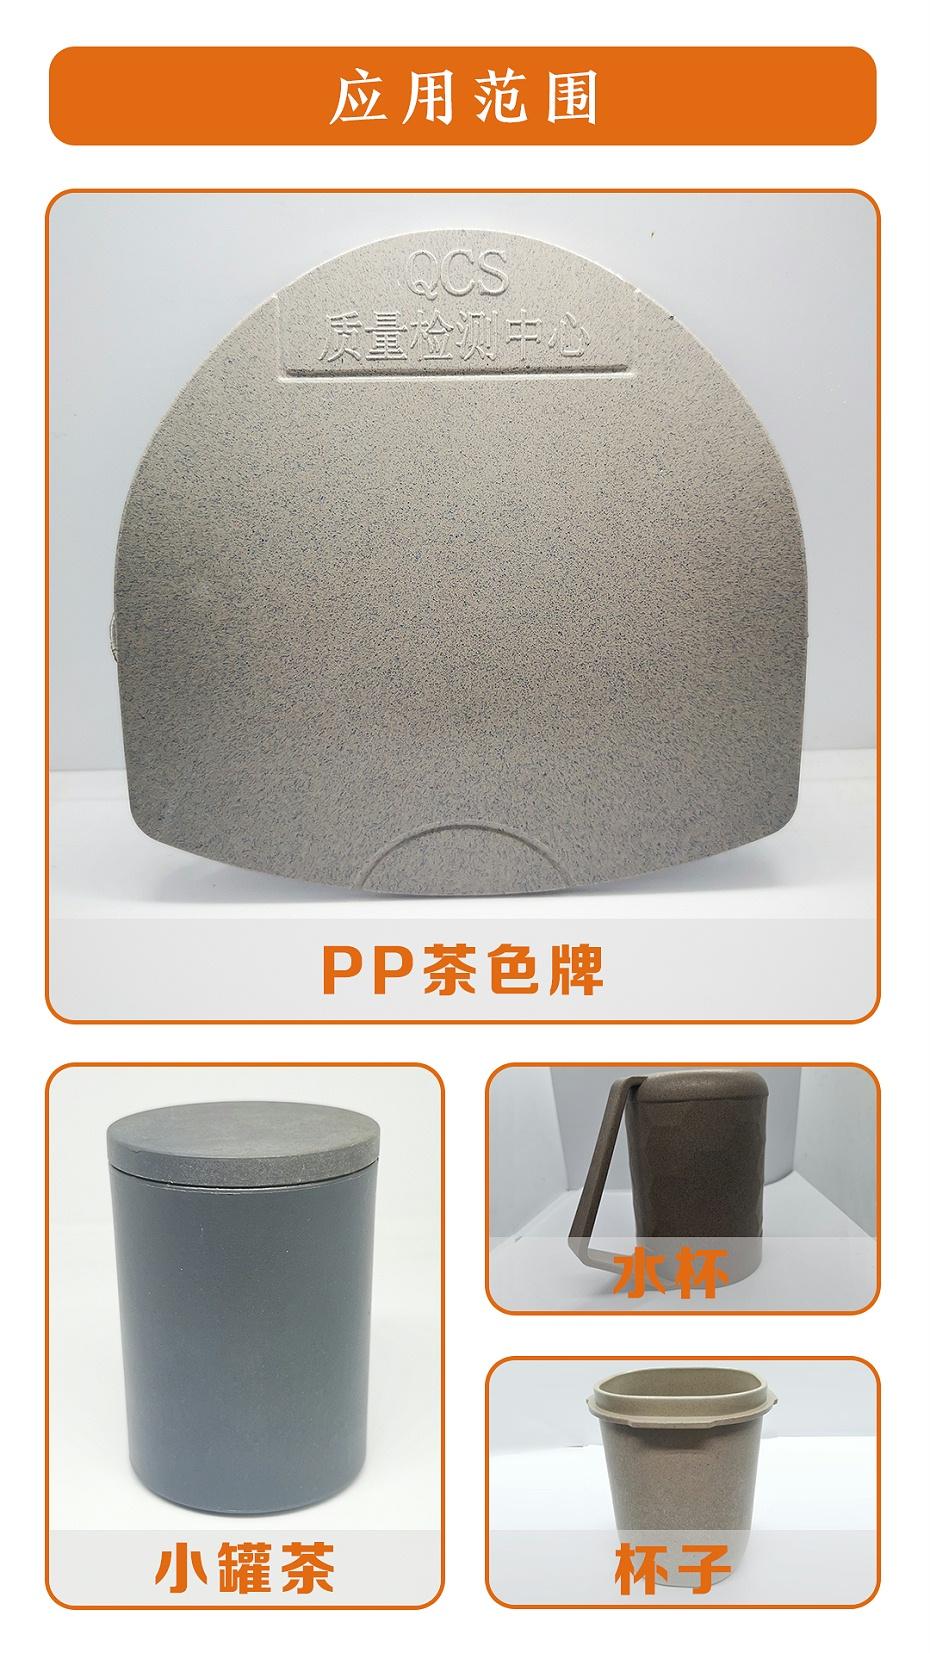 PP茶纤维应用图片